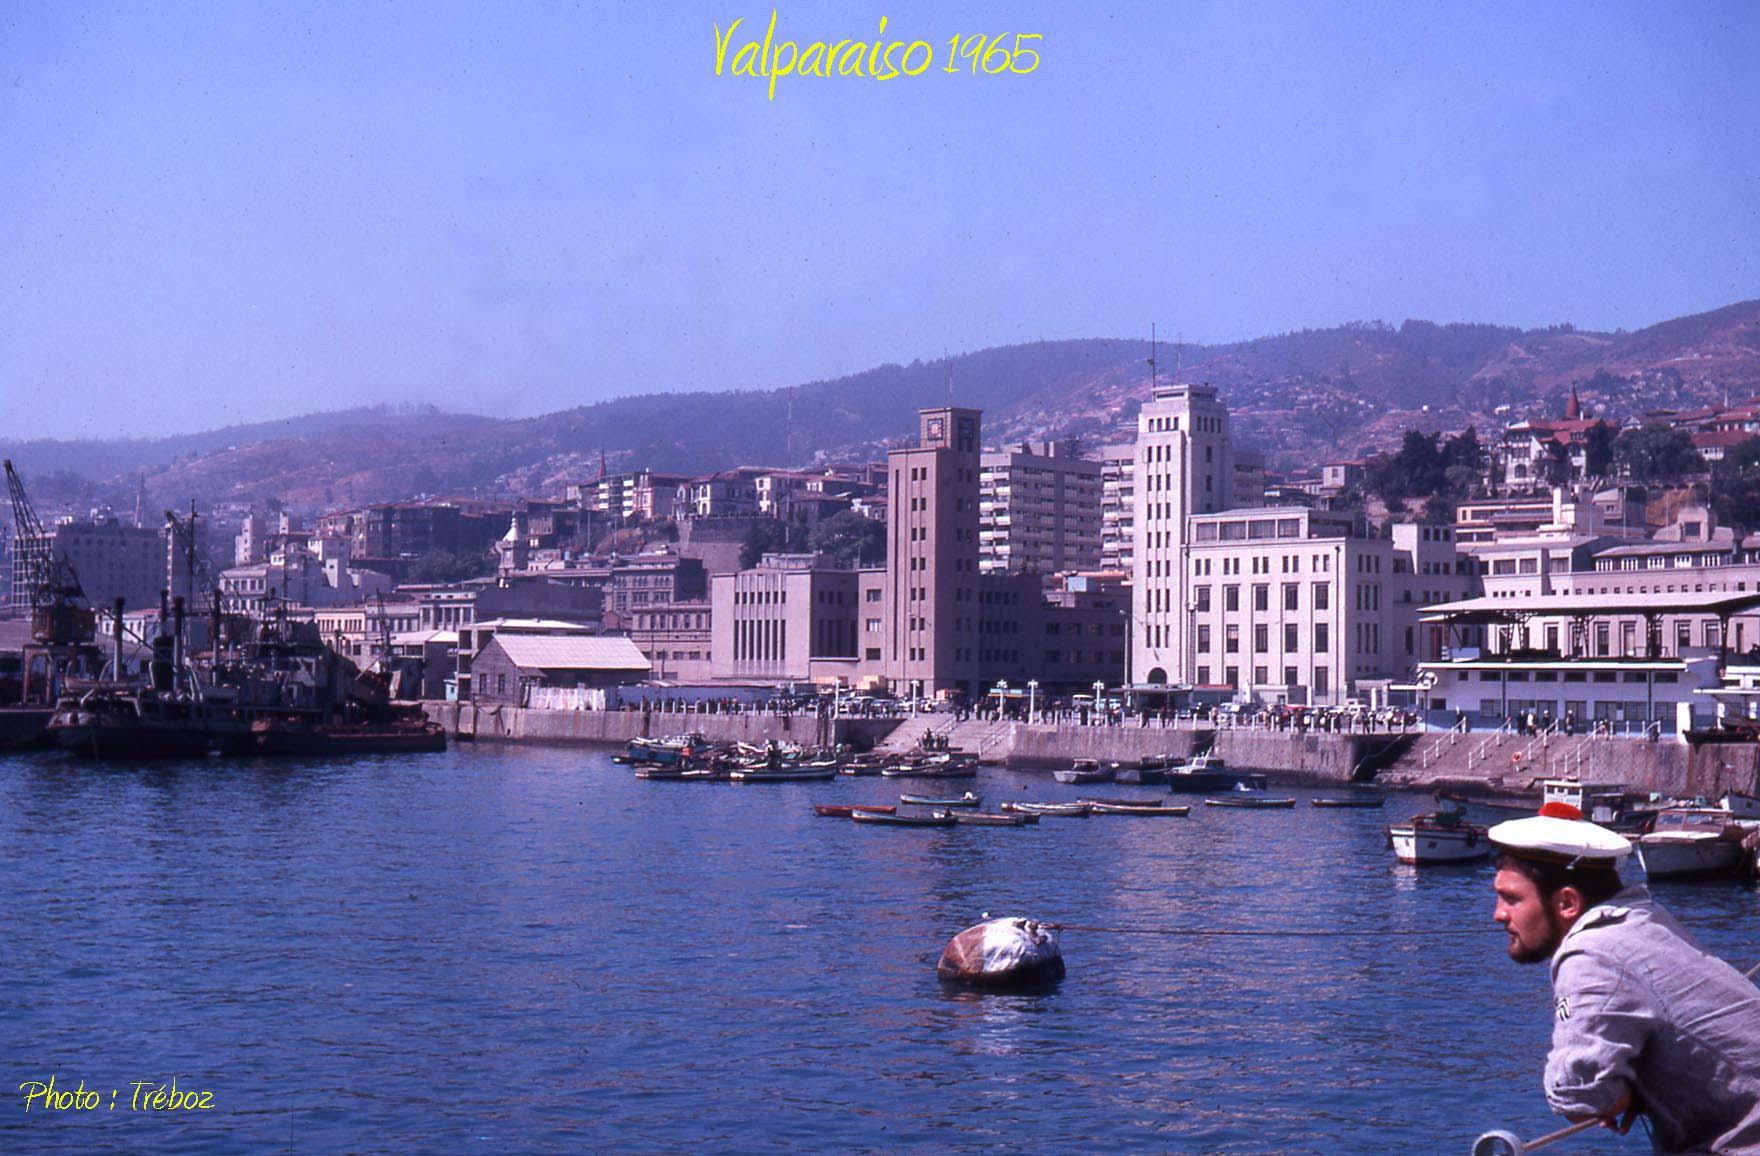 valparaiso1965.jpg